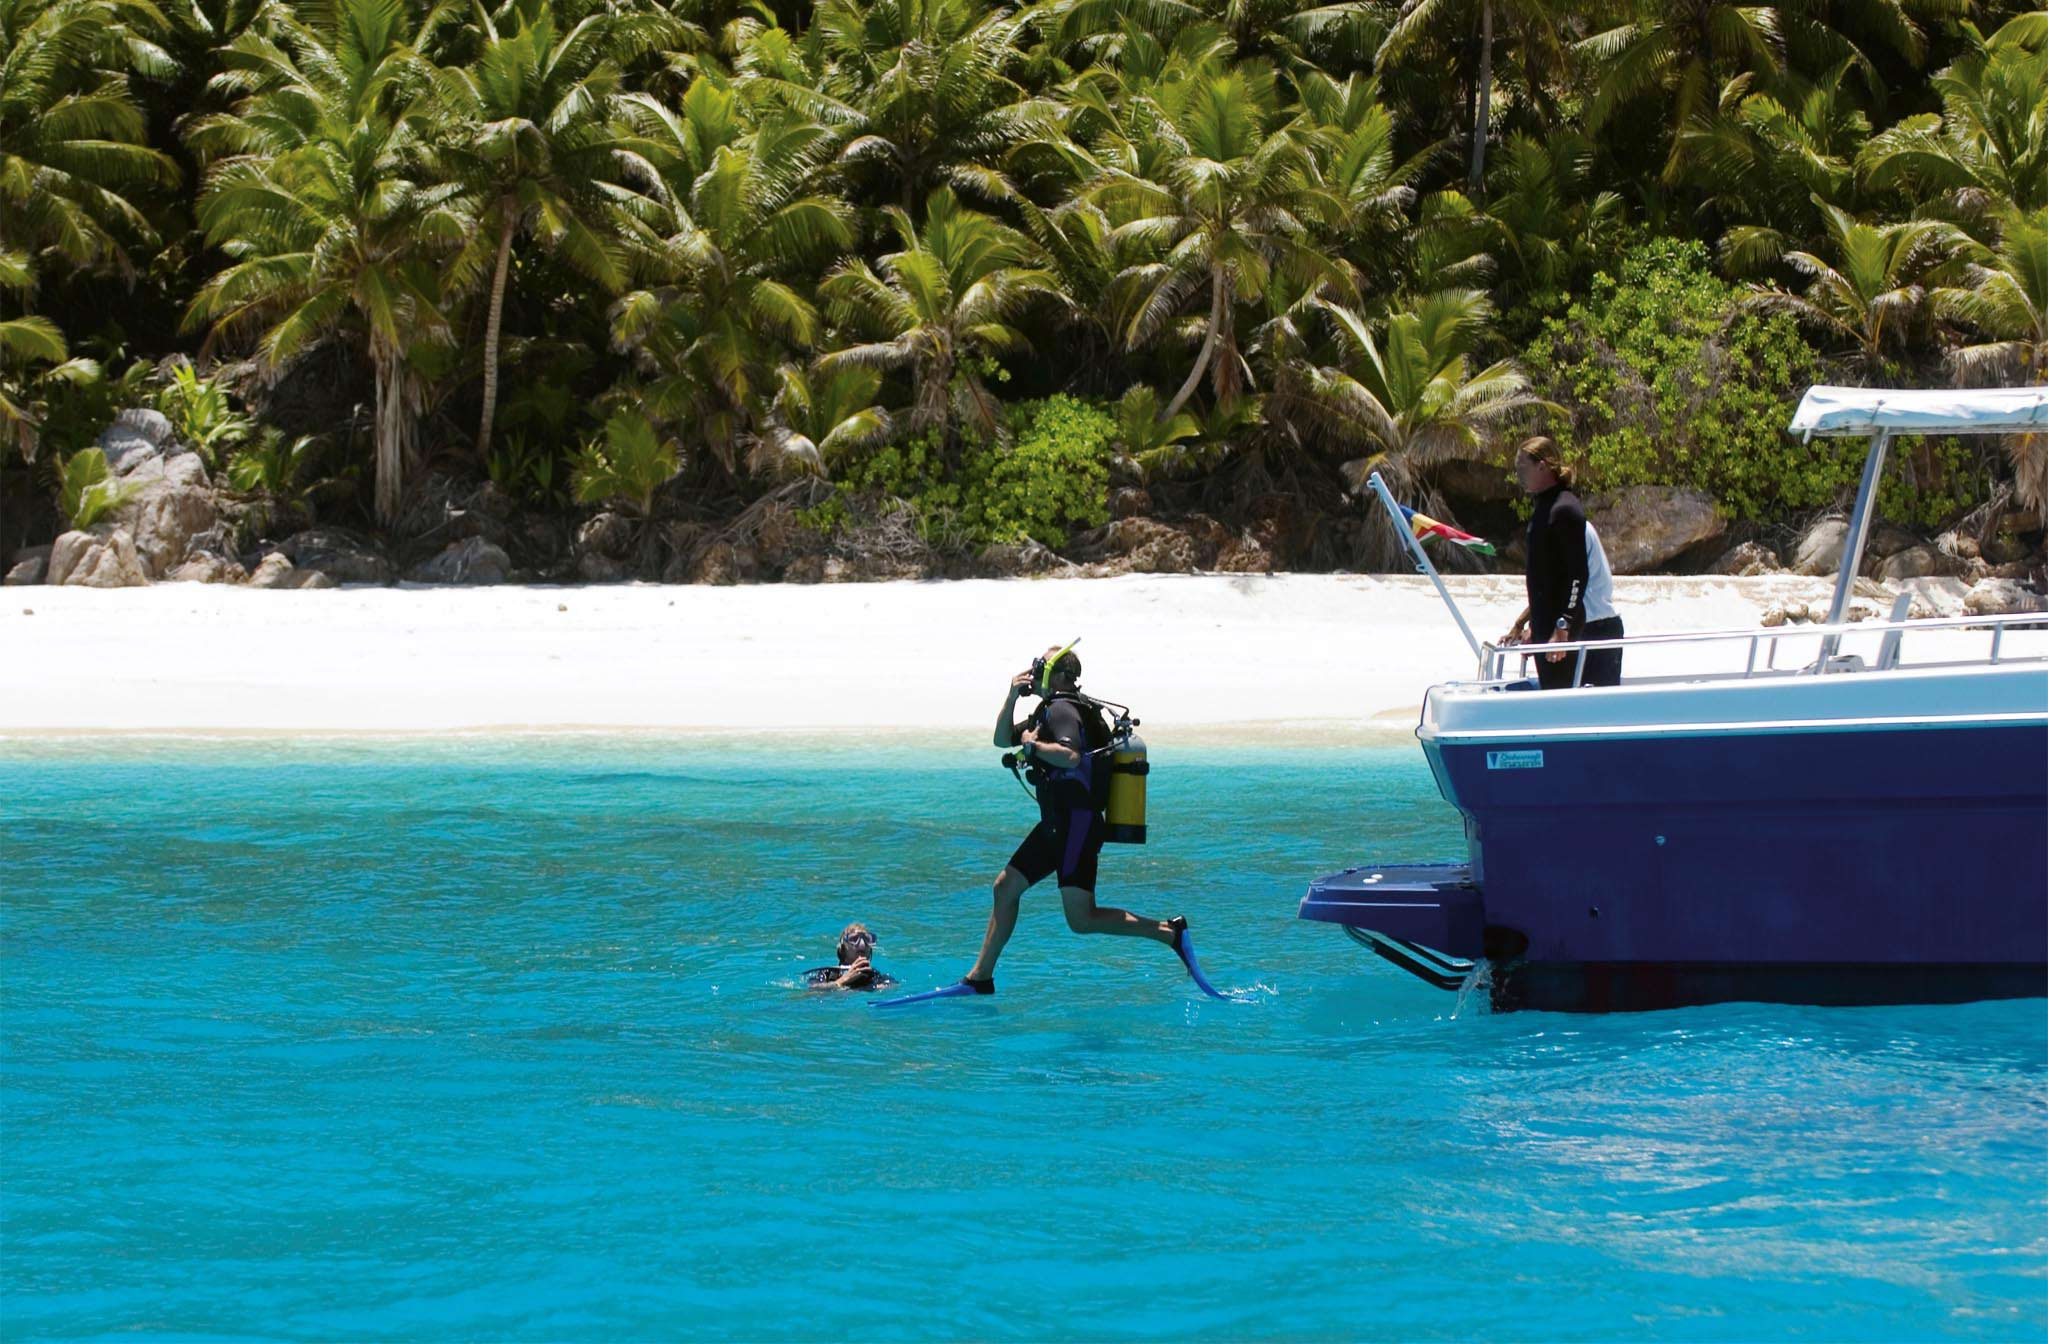 fregate-activities-water1.jpg